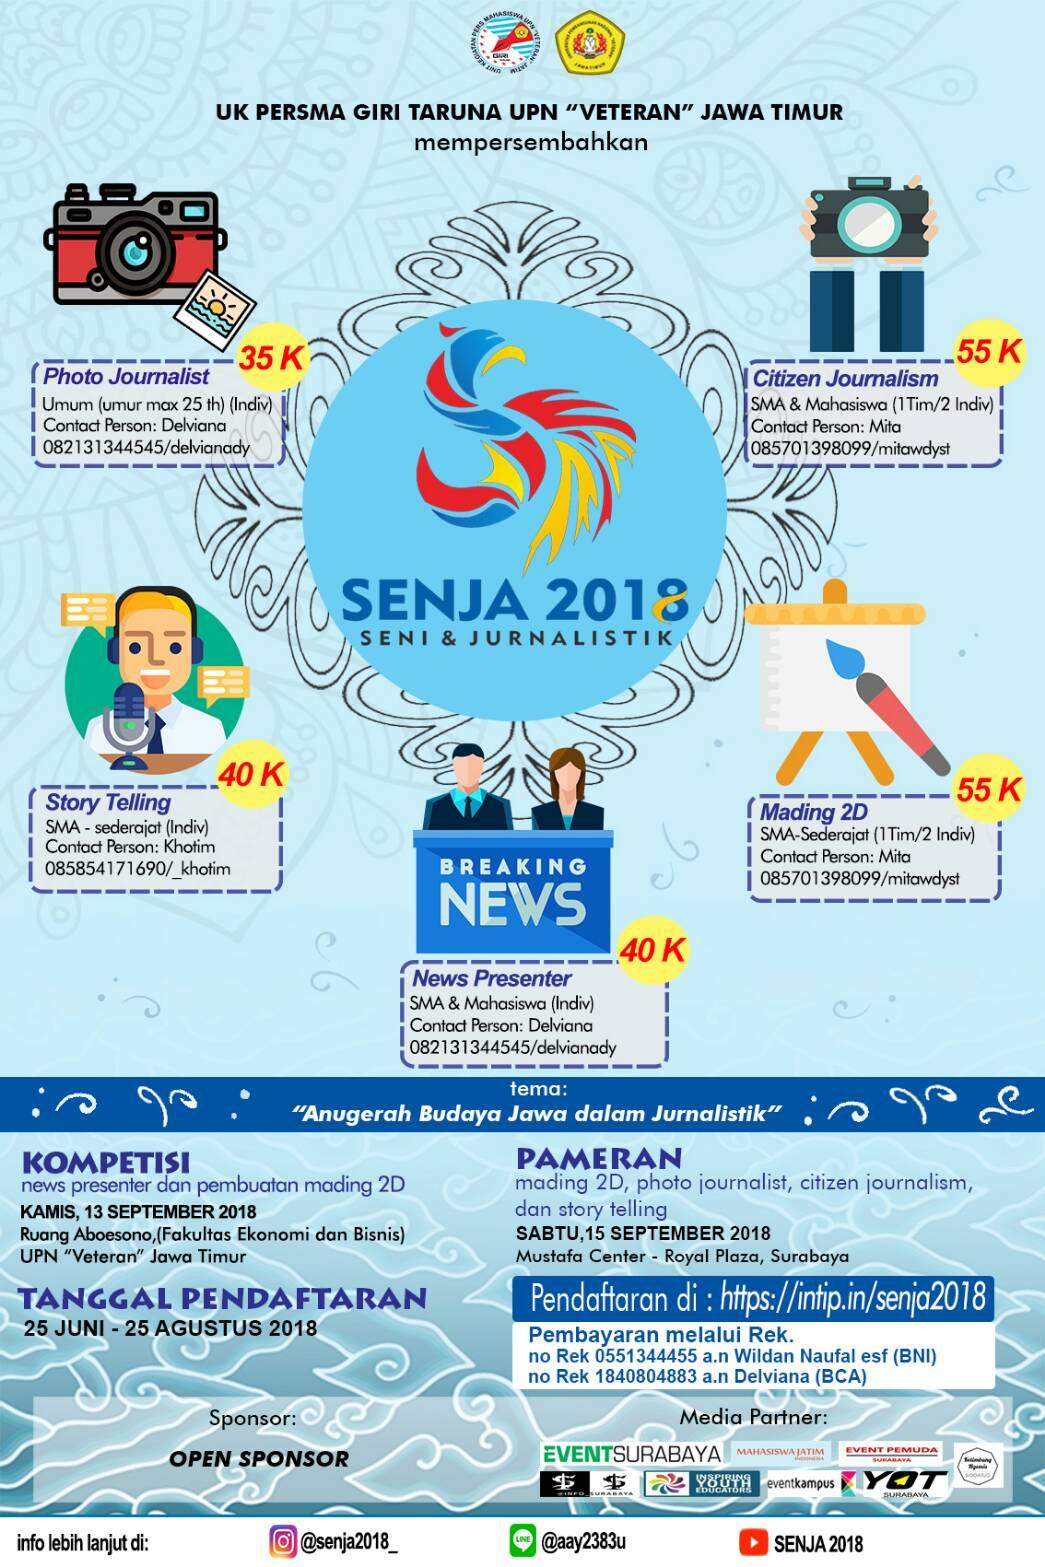 senja-2018-anugerah-budaya-jawa-dalam-jurnalistik